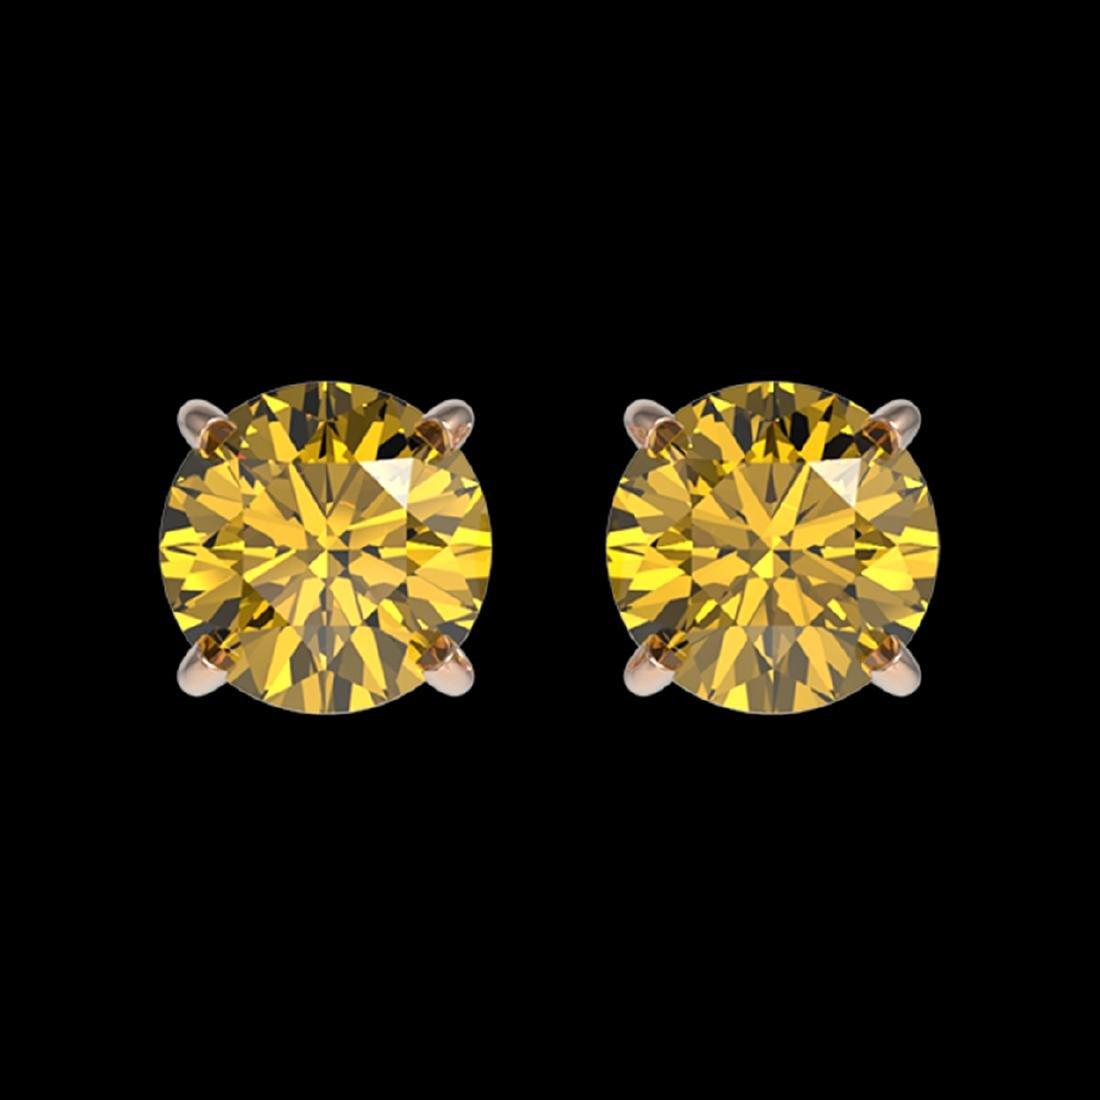 1 ctw Intense Yellow Diamond Stud Earrings 10K Rose